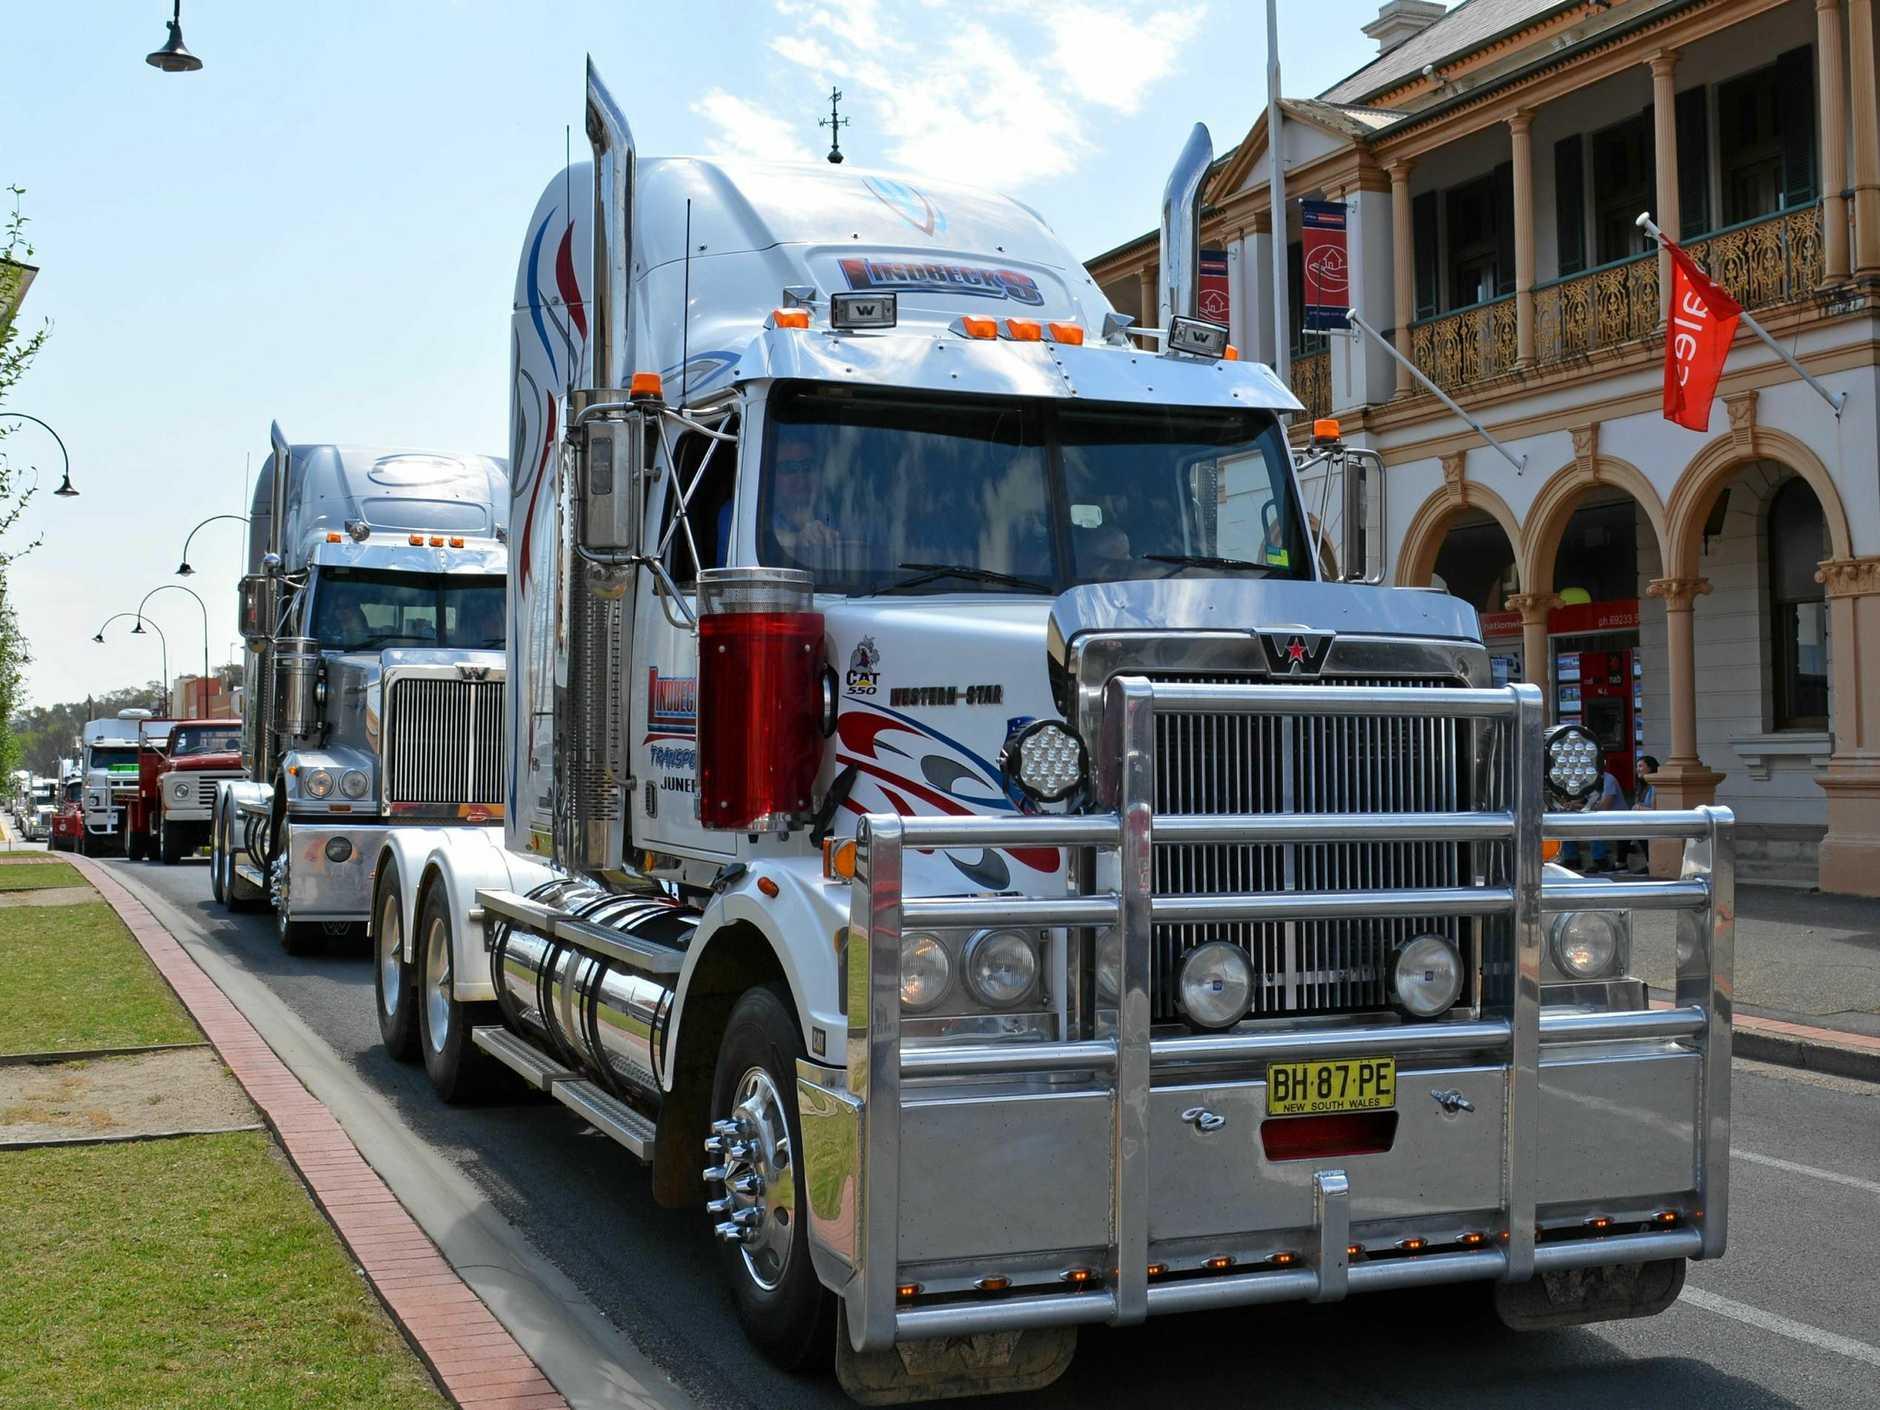 The trucks roll down Fitzmaurice Street.